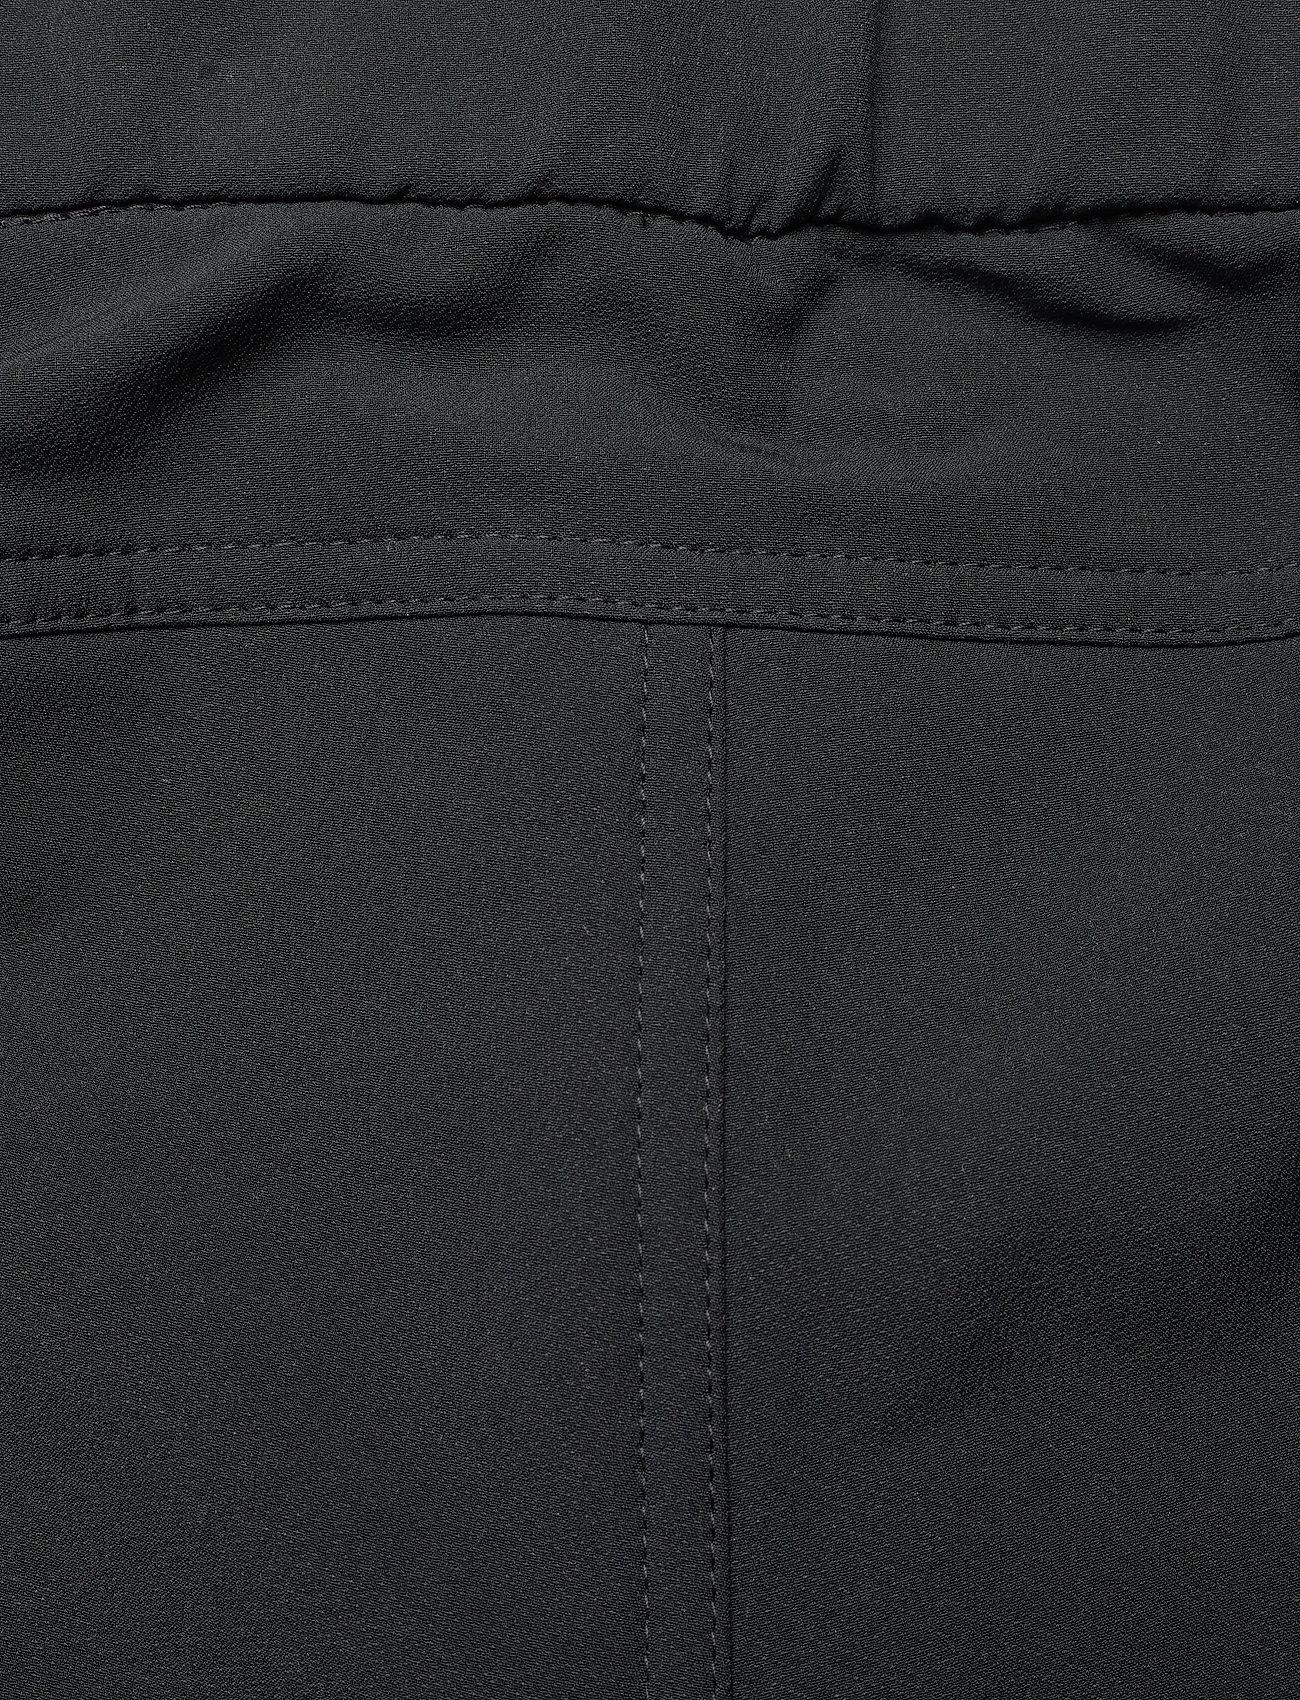 W Skitour Softs (Black) (1249.50 kr) - adidas Performance